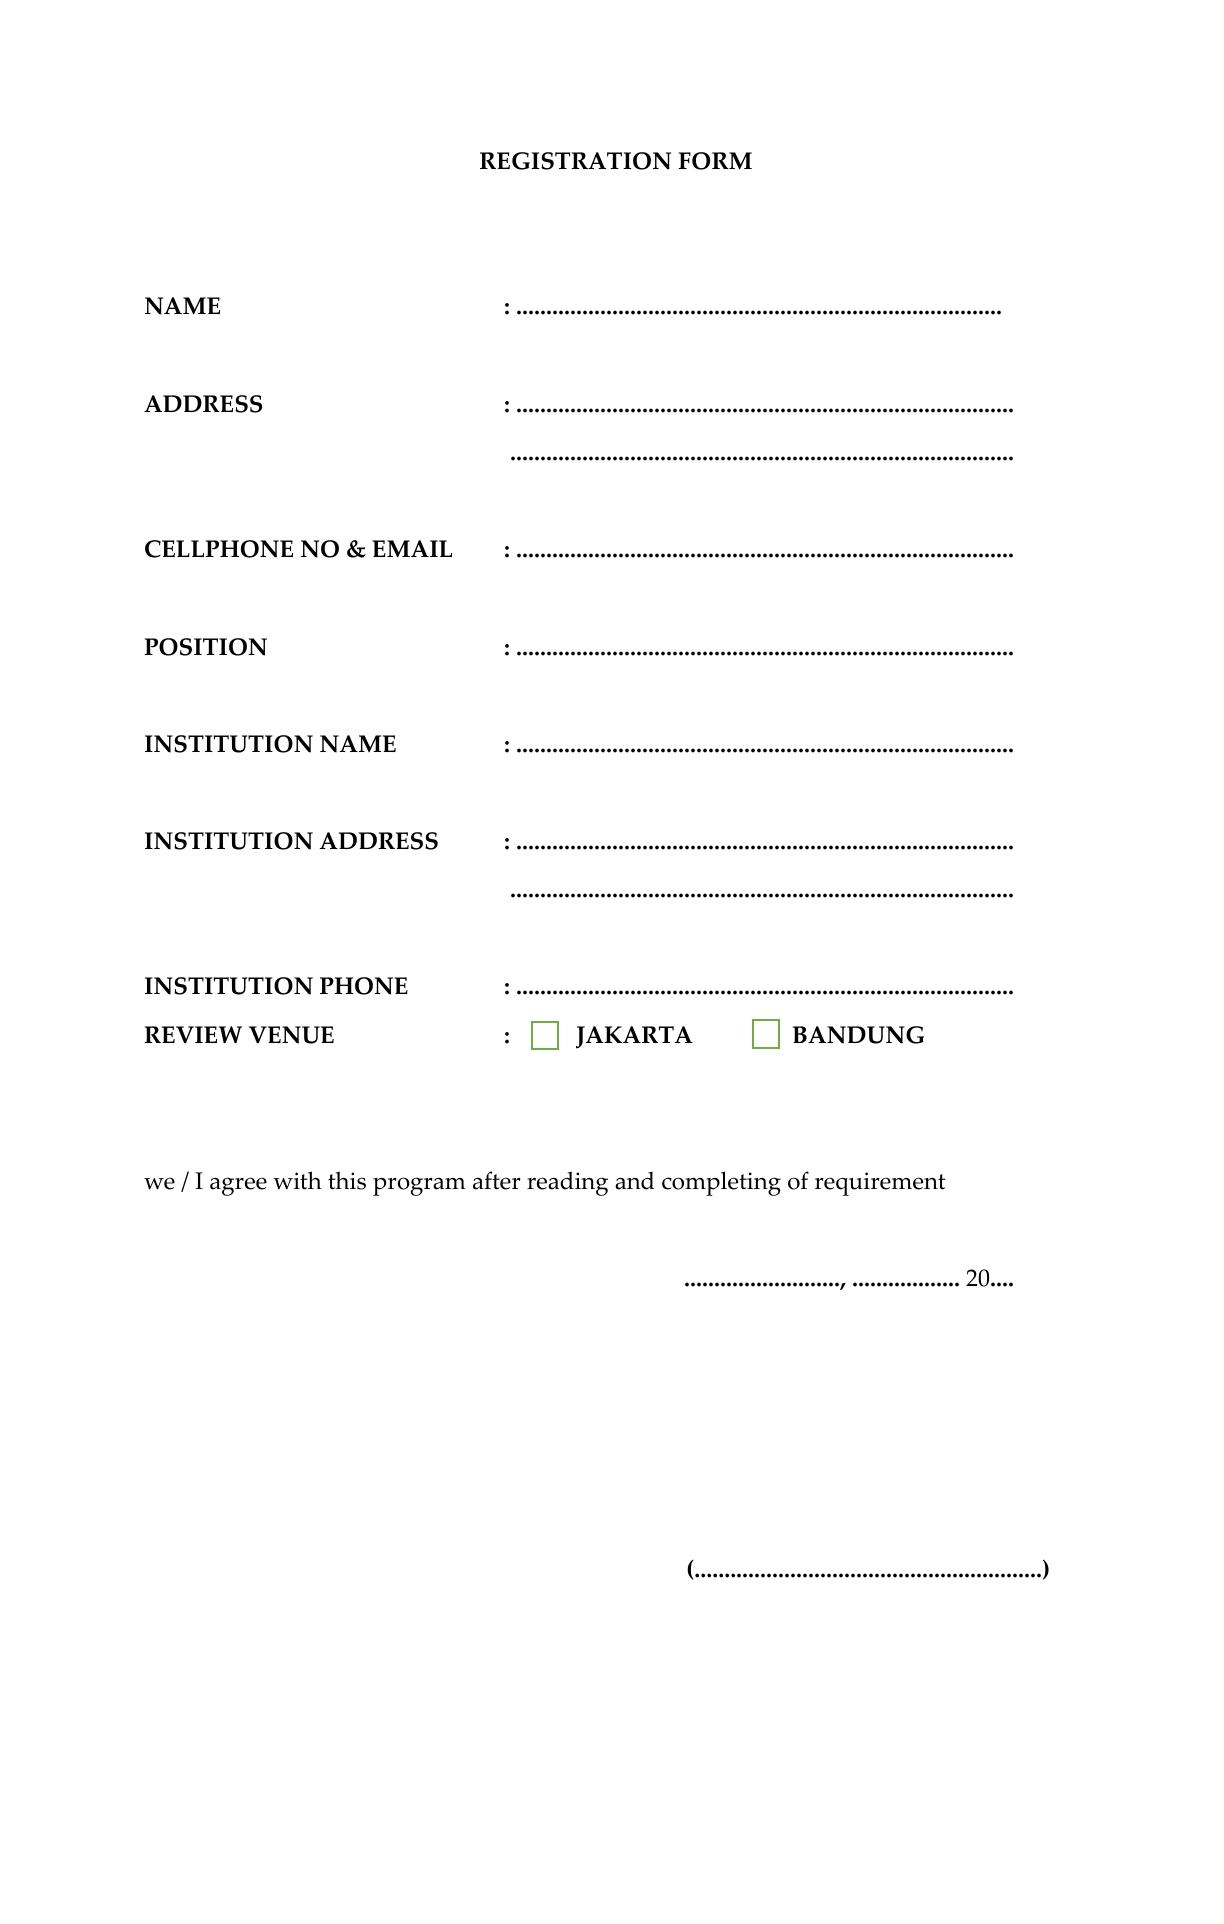 Surat Pemberitahuan Next Program LSP Nakes3